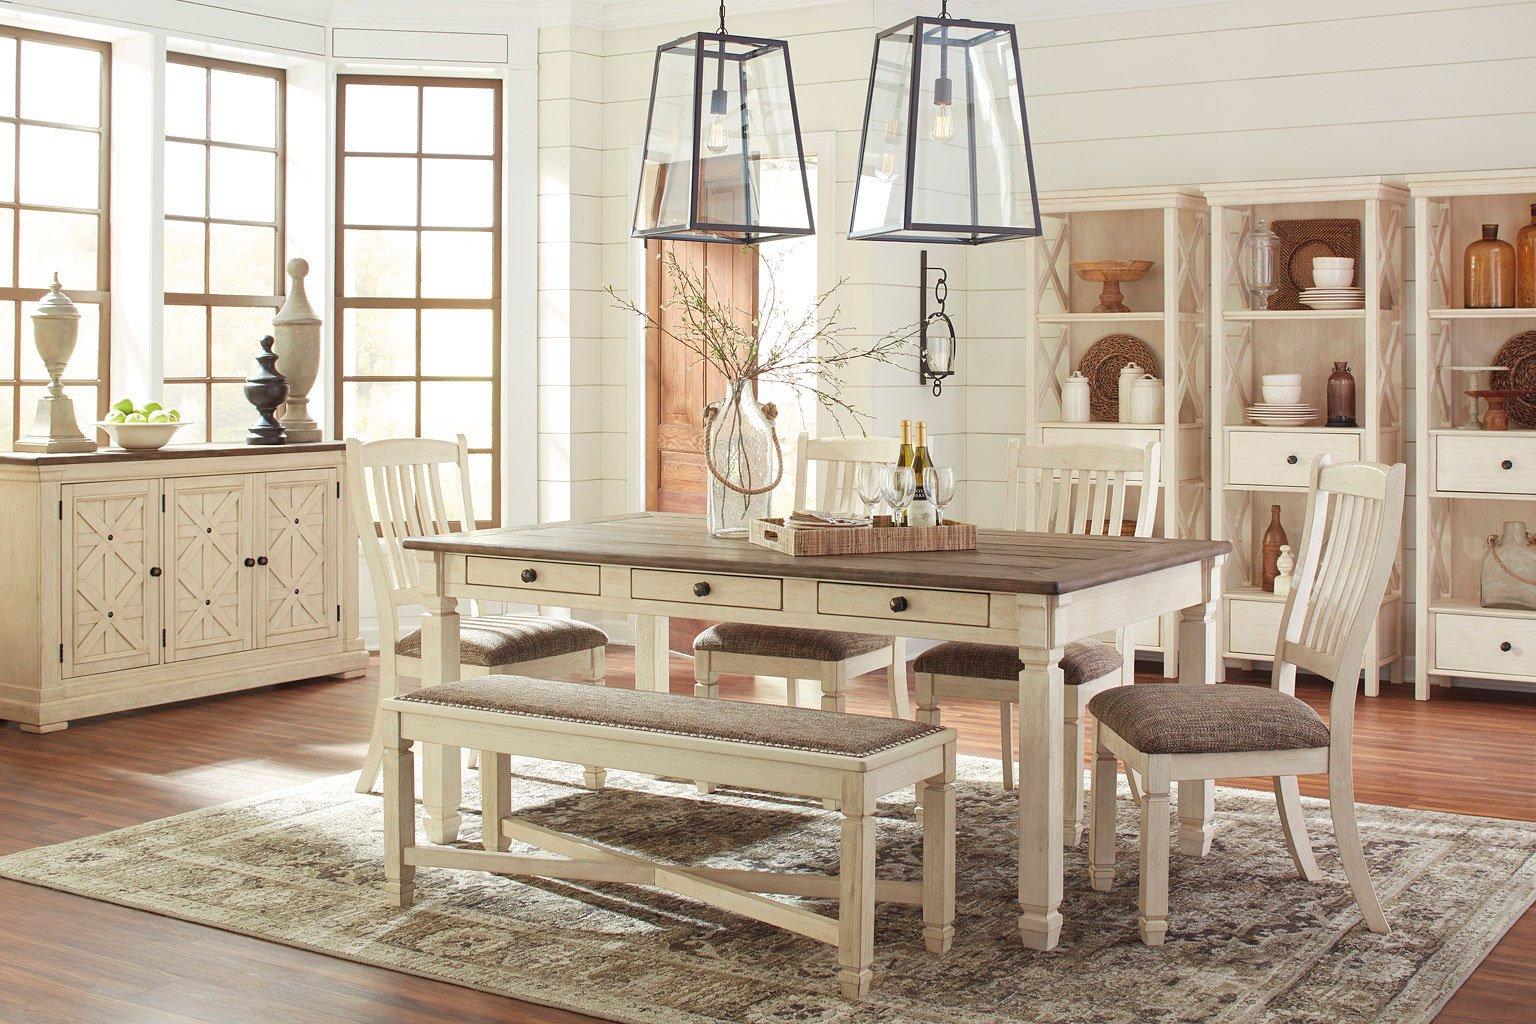 Bolanburg Dining Room Set w/ Bench